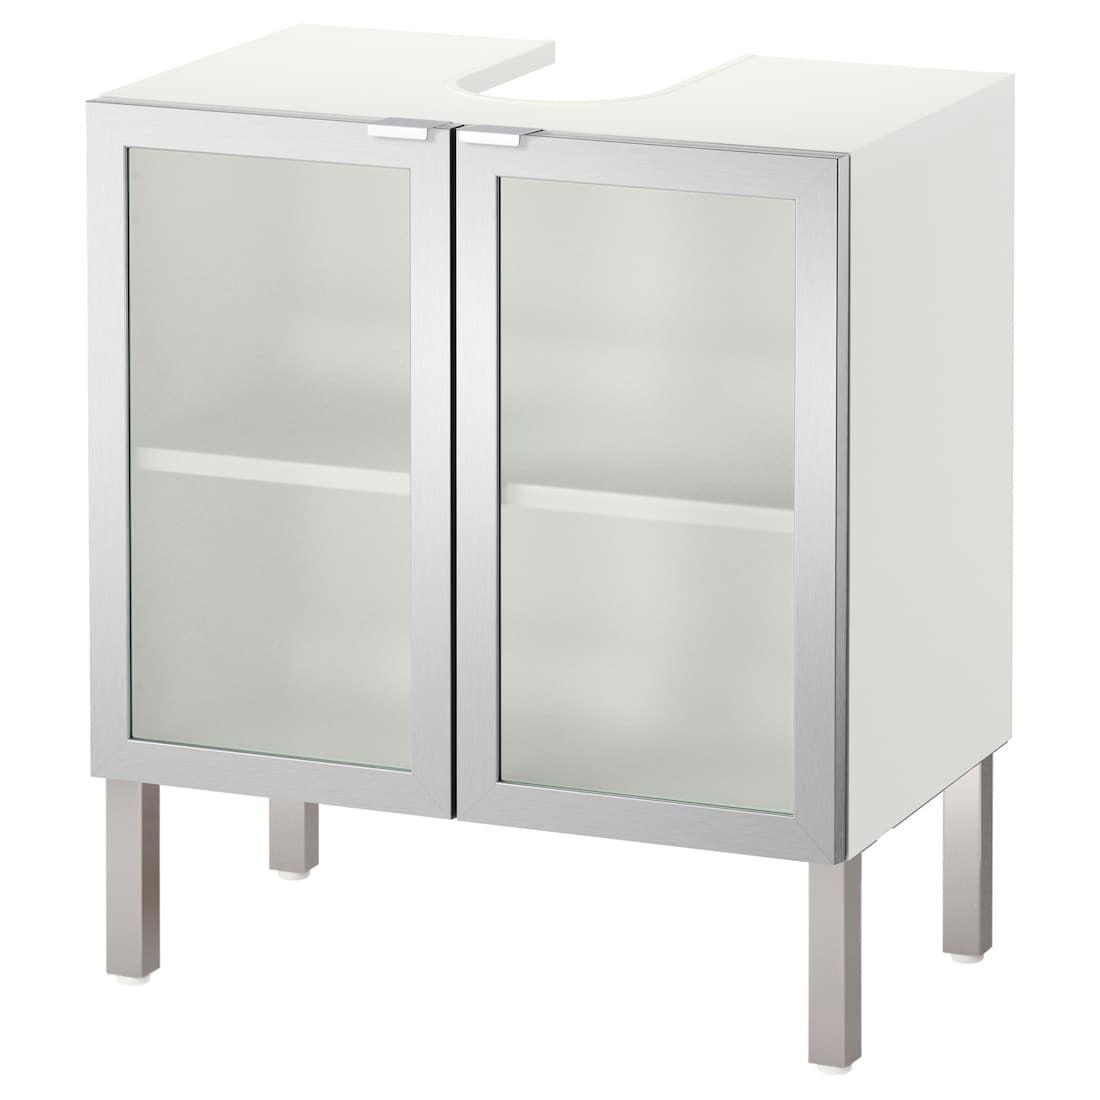 Lillangen Element Lavabo A 2 Portes Aluminium 60x38x66 Cm Meuble Sous Lavabo Meuble Sous Lavabo Ikea Et Meuble Vasque Ikea